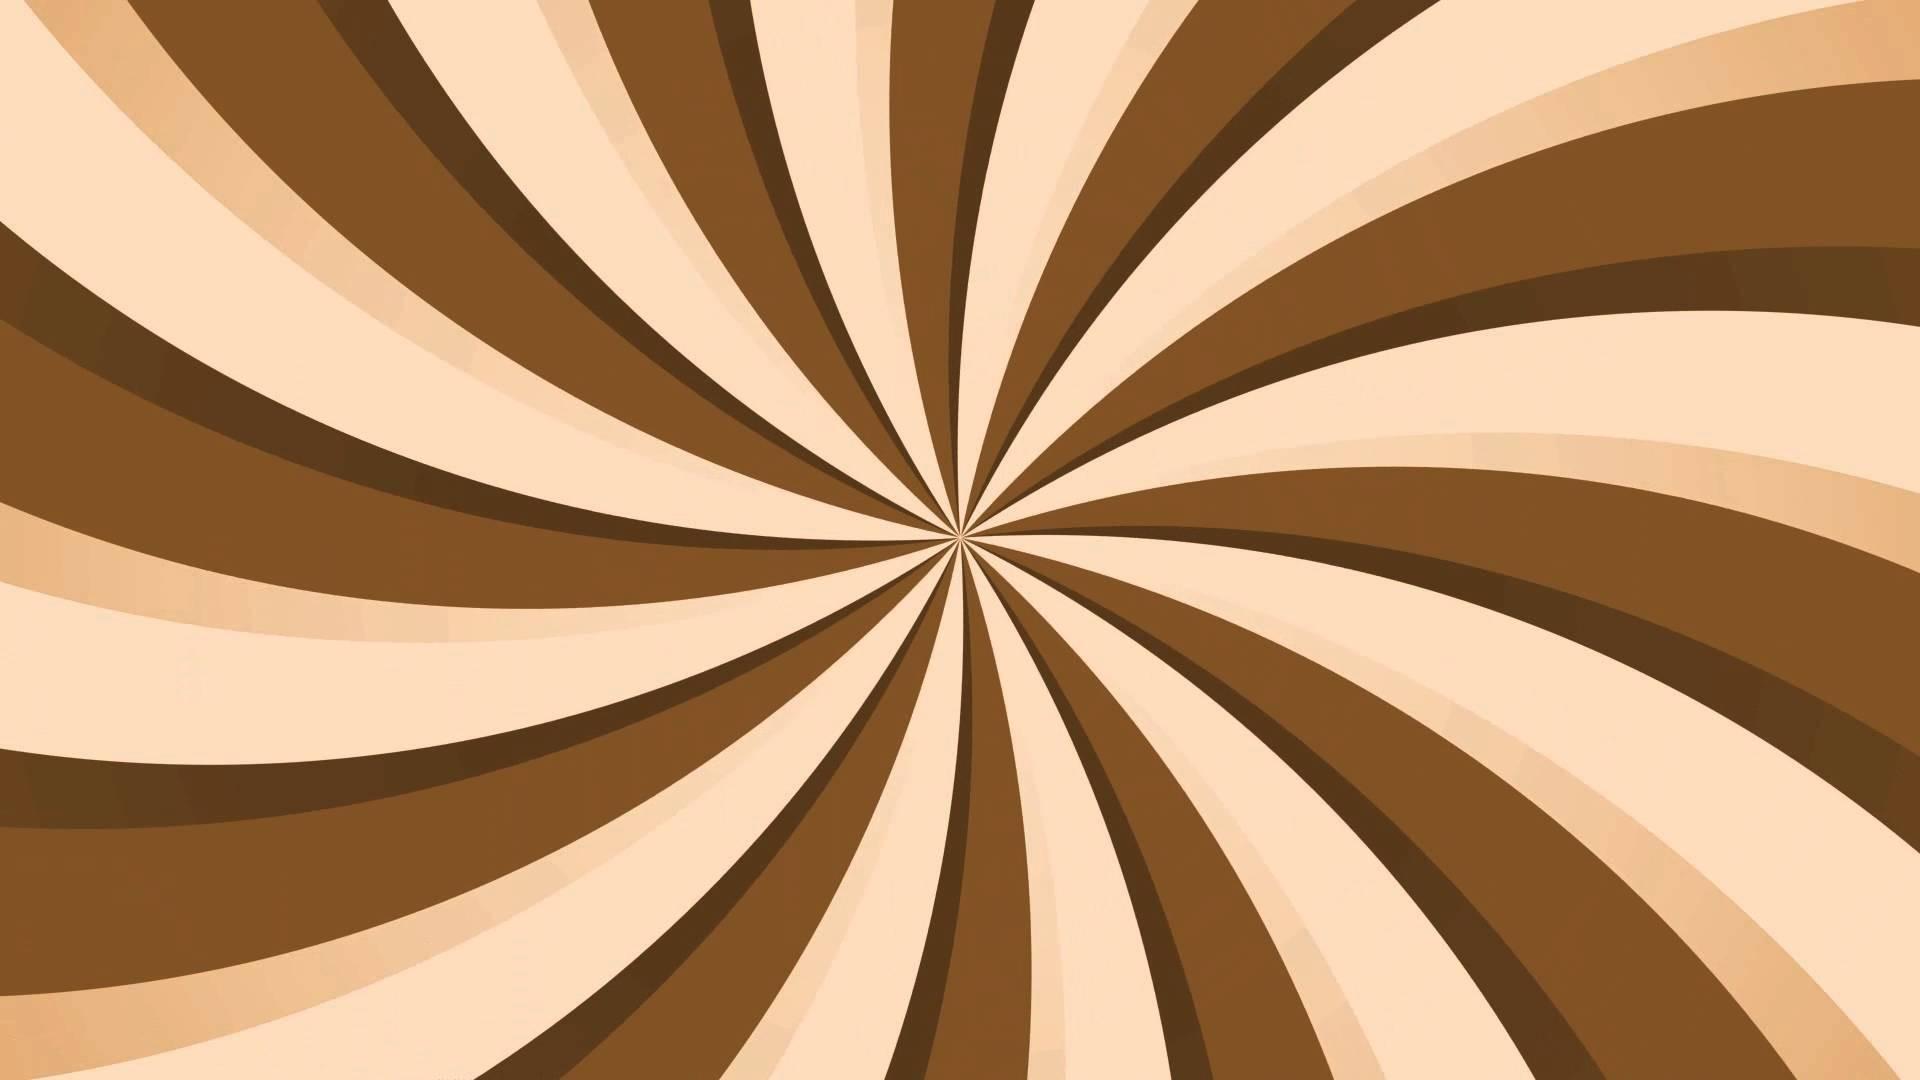 1920x1080 free rotating stripes background animation